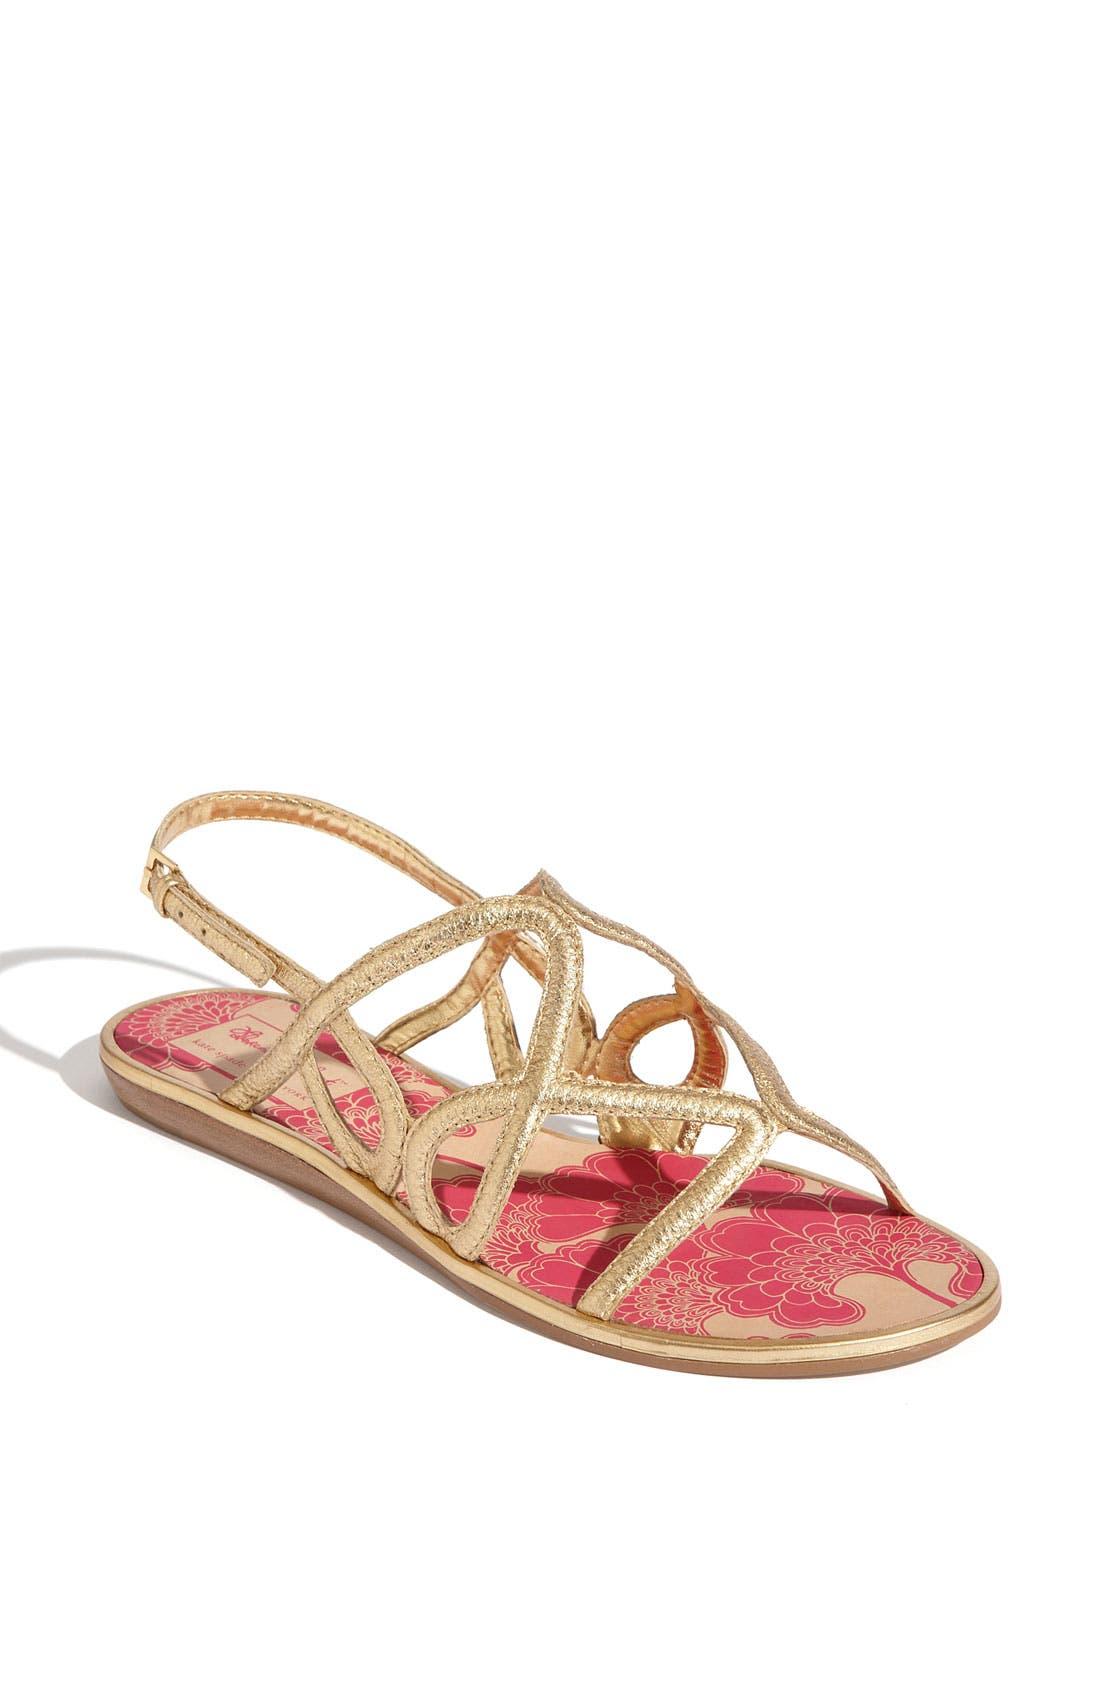 Alternate Image 1 Selected - kate spade new york 'iris' flat sandal